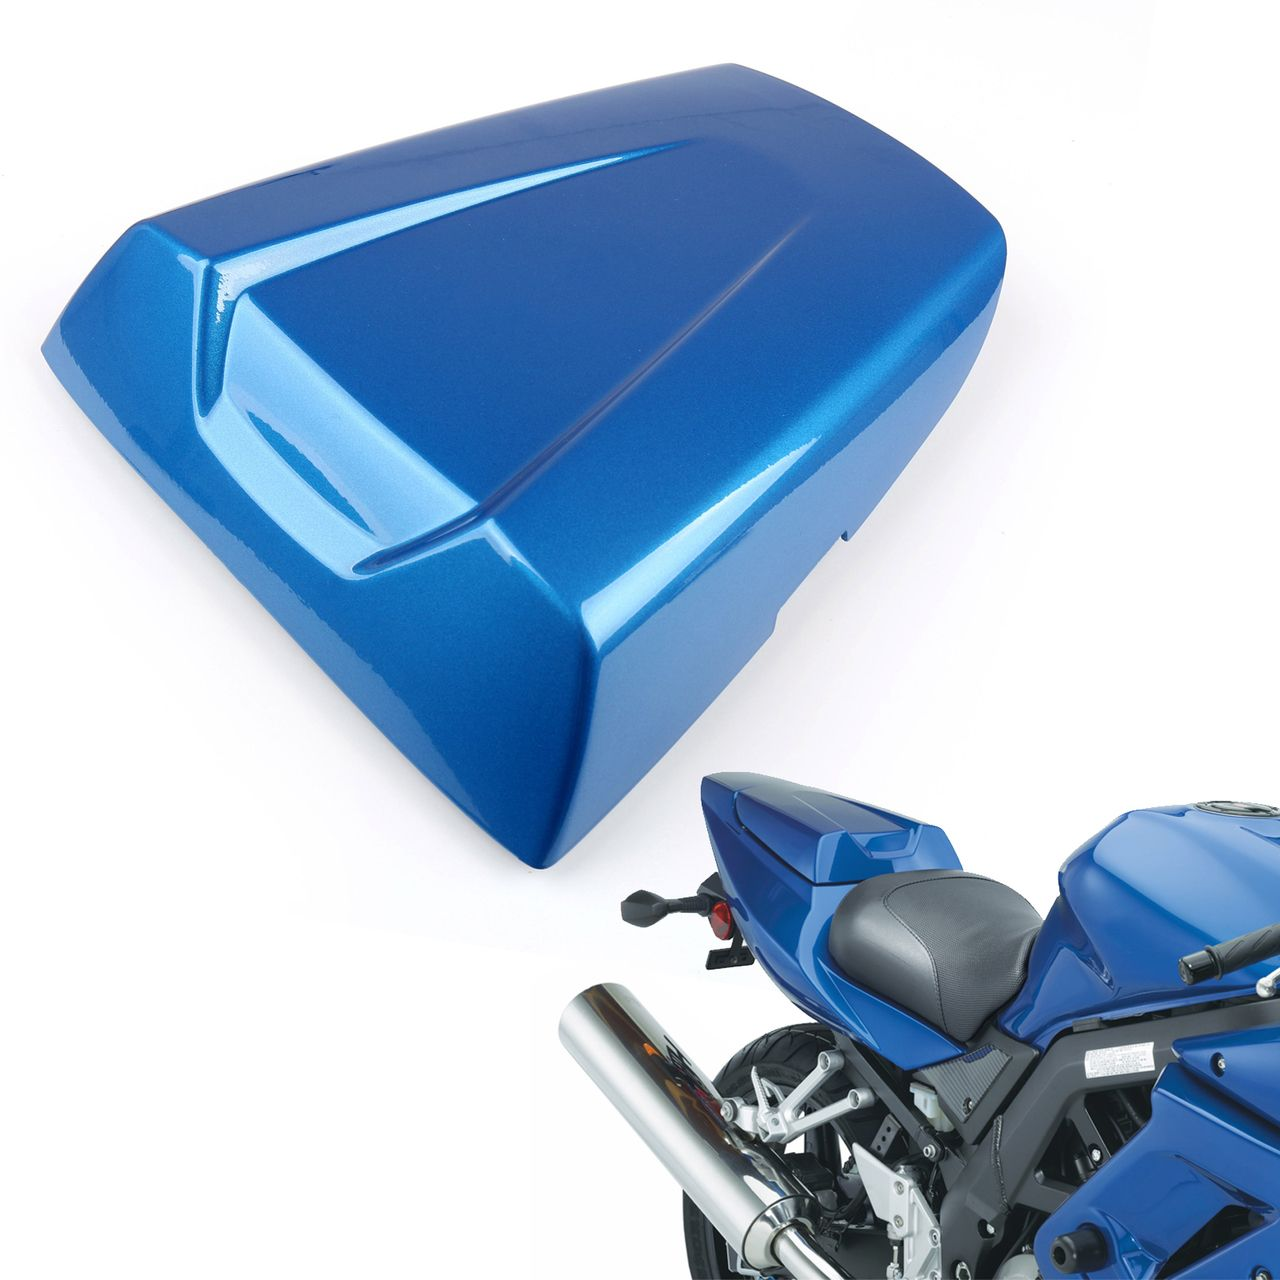 hight resolution of mad hornets rear passenger seat cover cowl suzuki sv650 sv1000 2003 2010 2004 2005